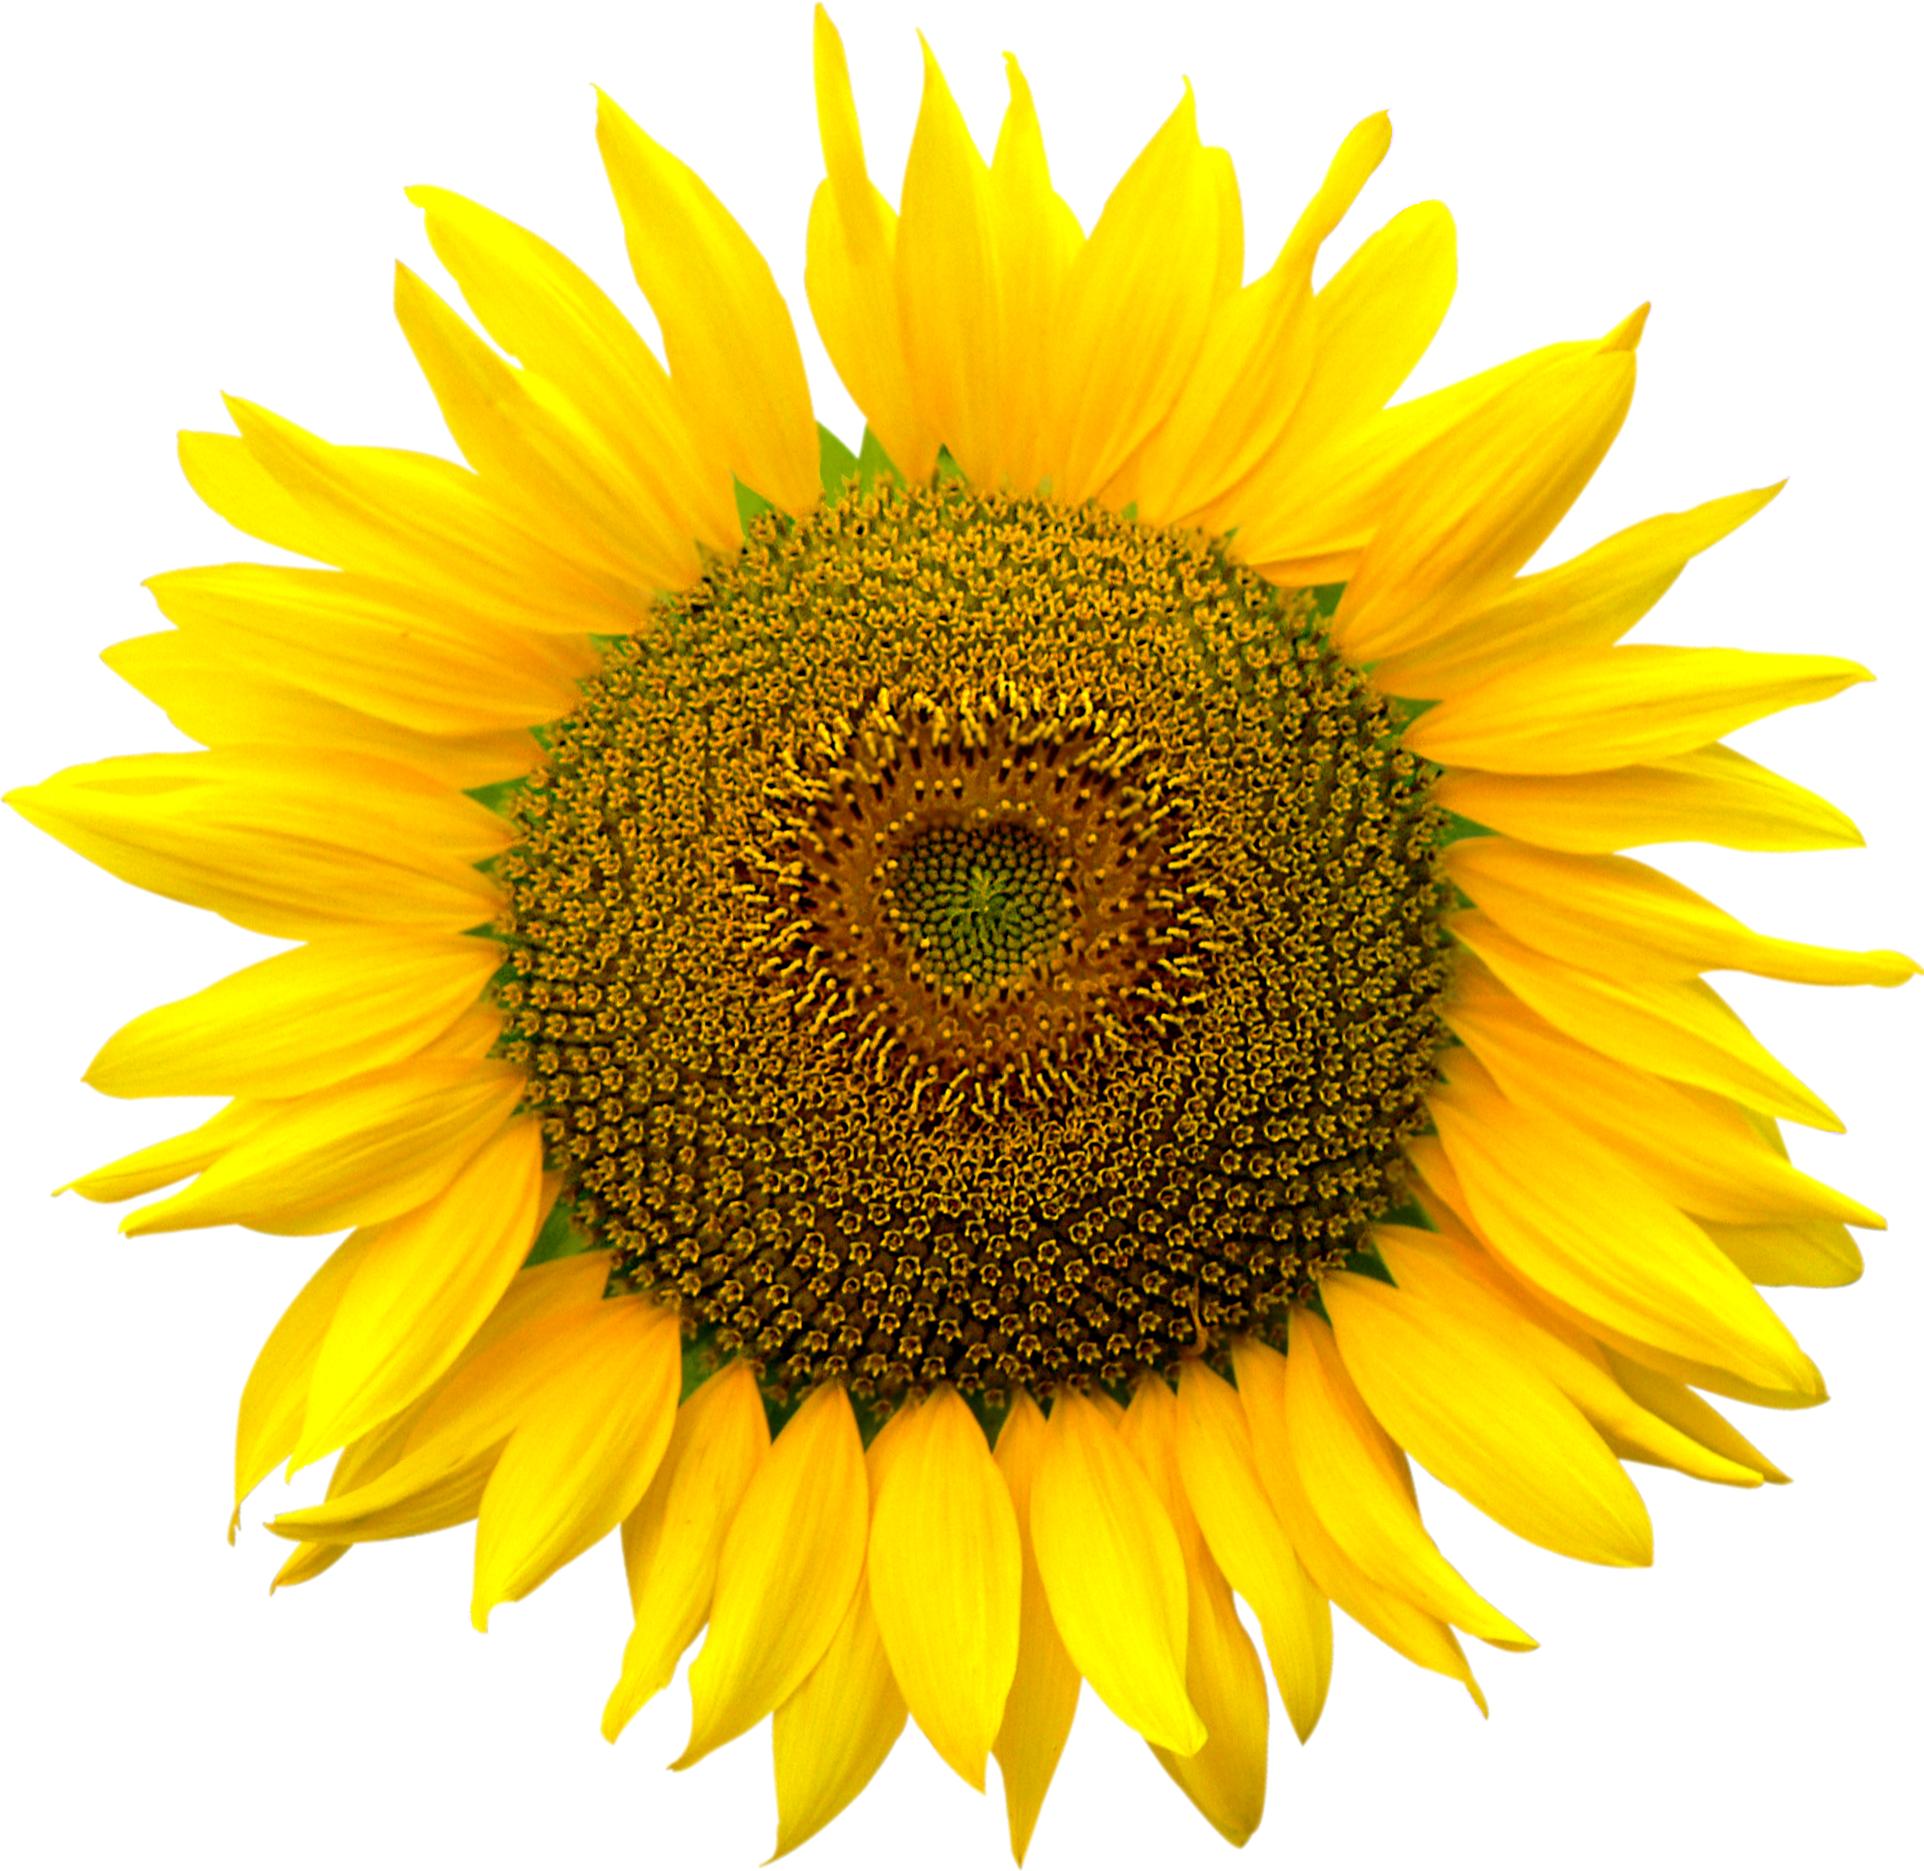 Sunflower heart inside file. Png format images